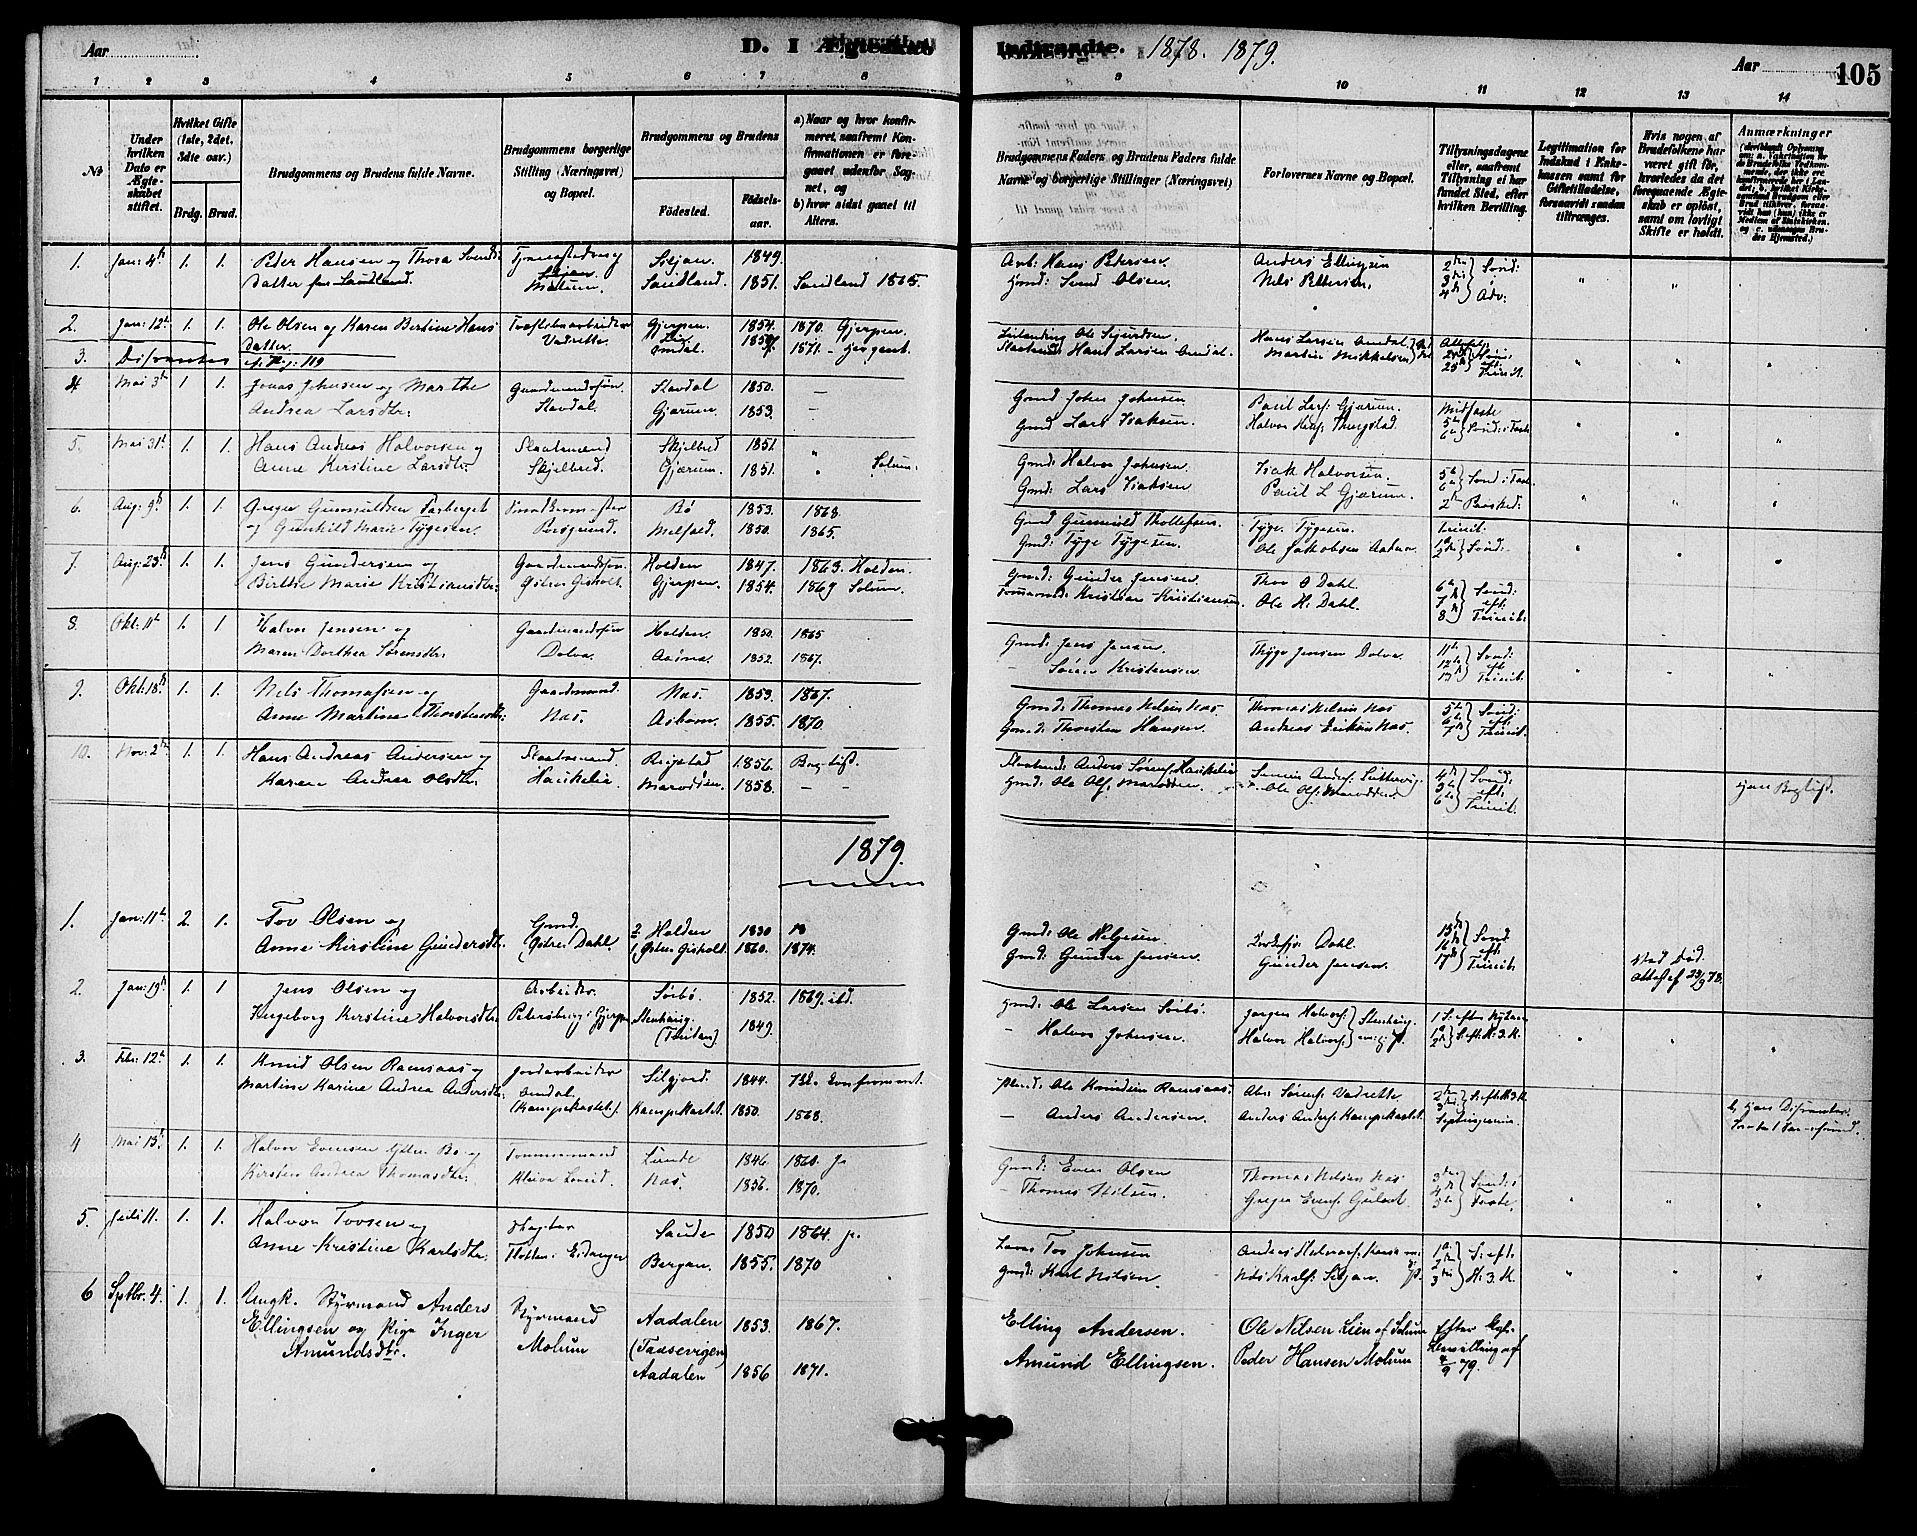 SAKO, Solum kirkebøker, F/Fb/L0001: Ministerialbok nr. II 1, 1877-1892, s. 105